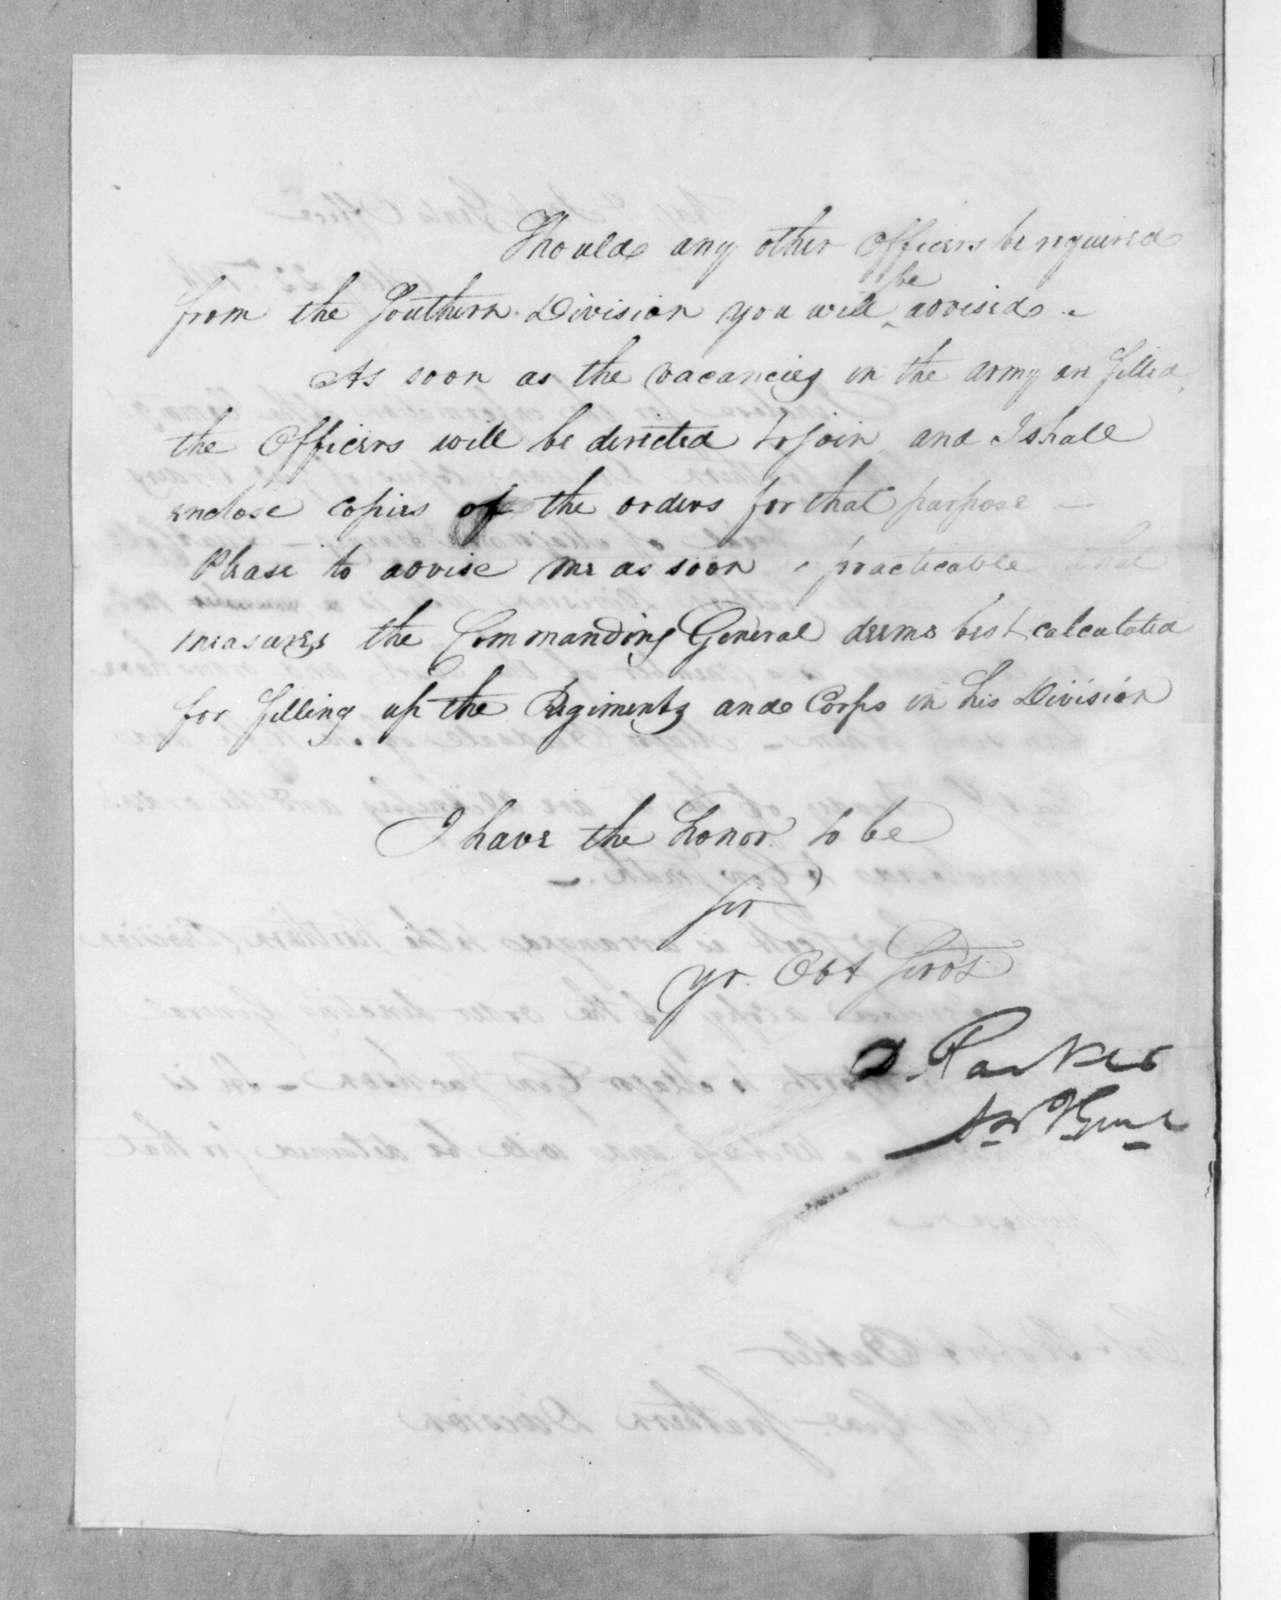 Daniel Parker to Robert Butler, May 22, 1816